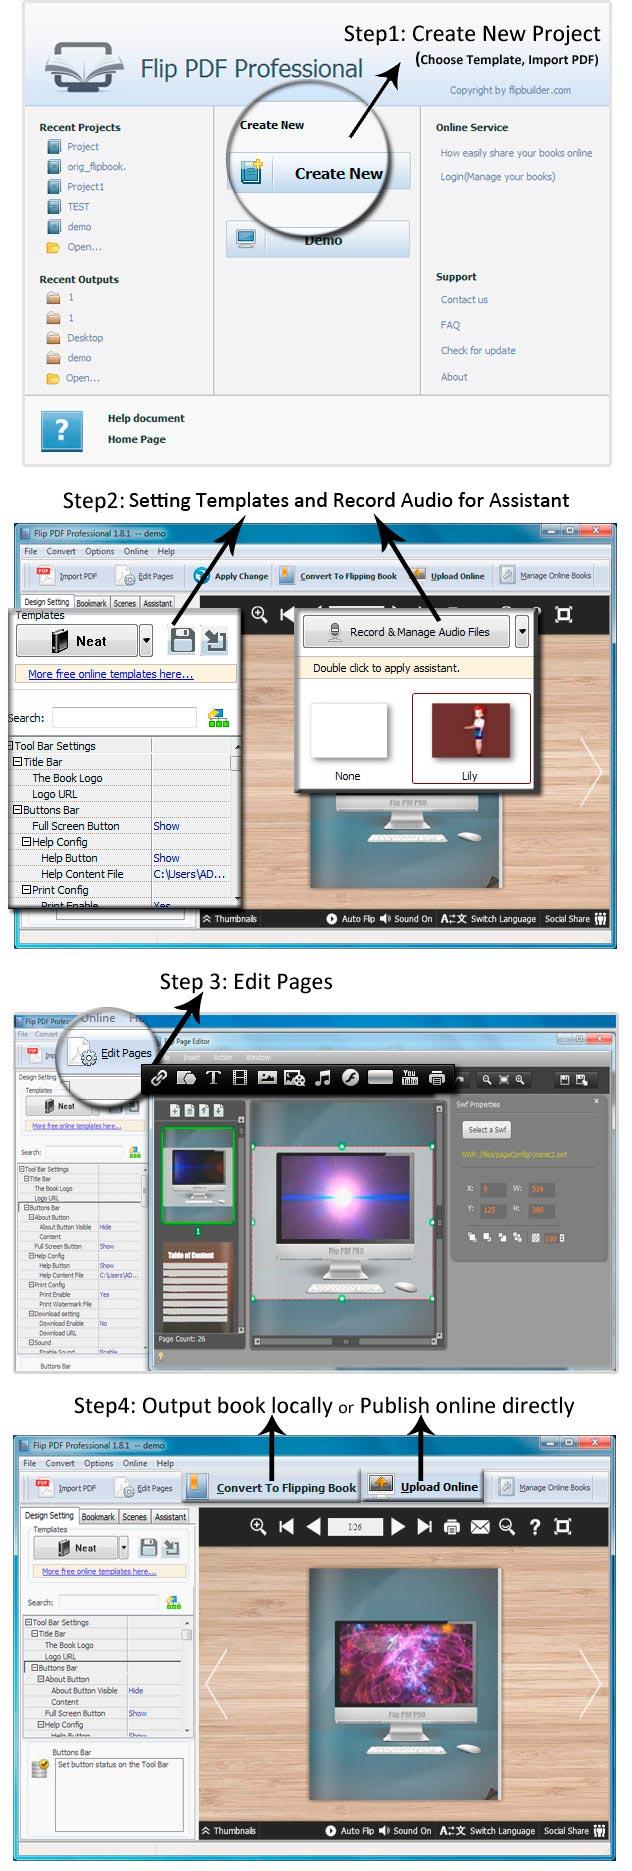 Convert multiple PDF files into an ebook ?